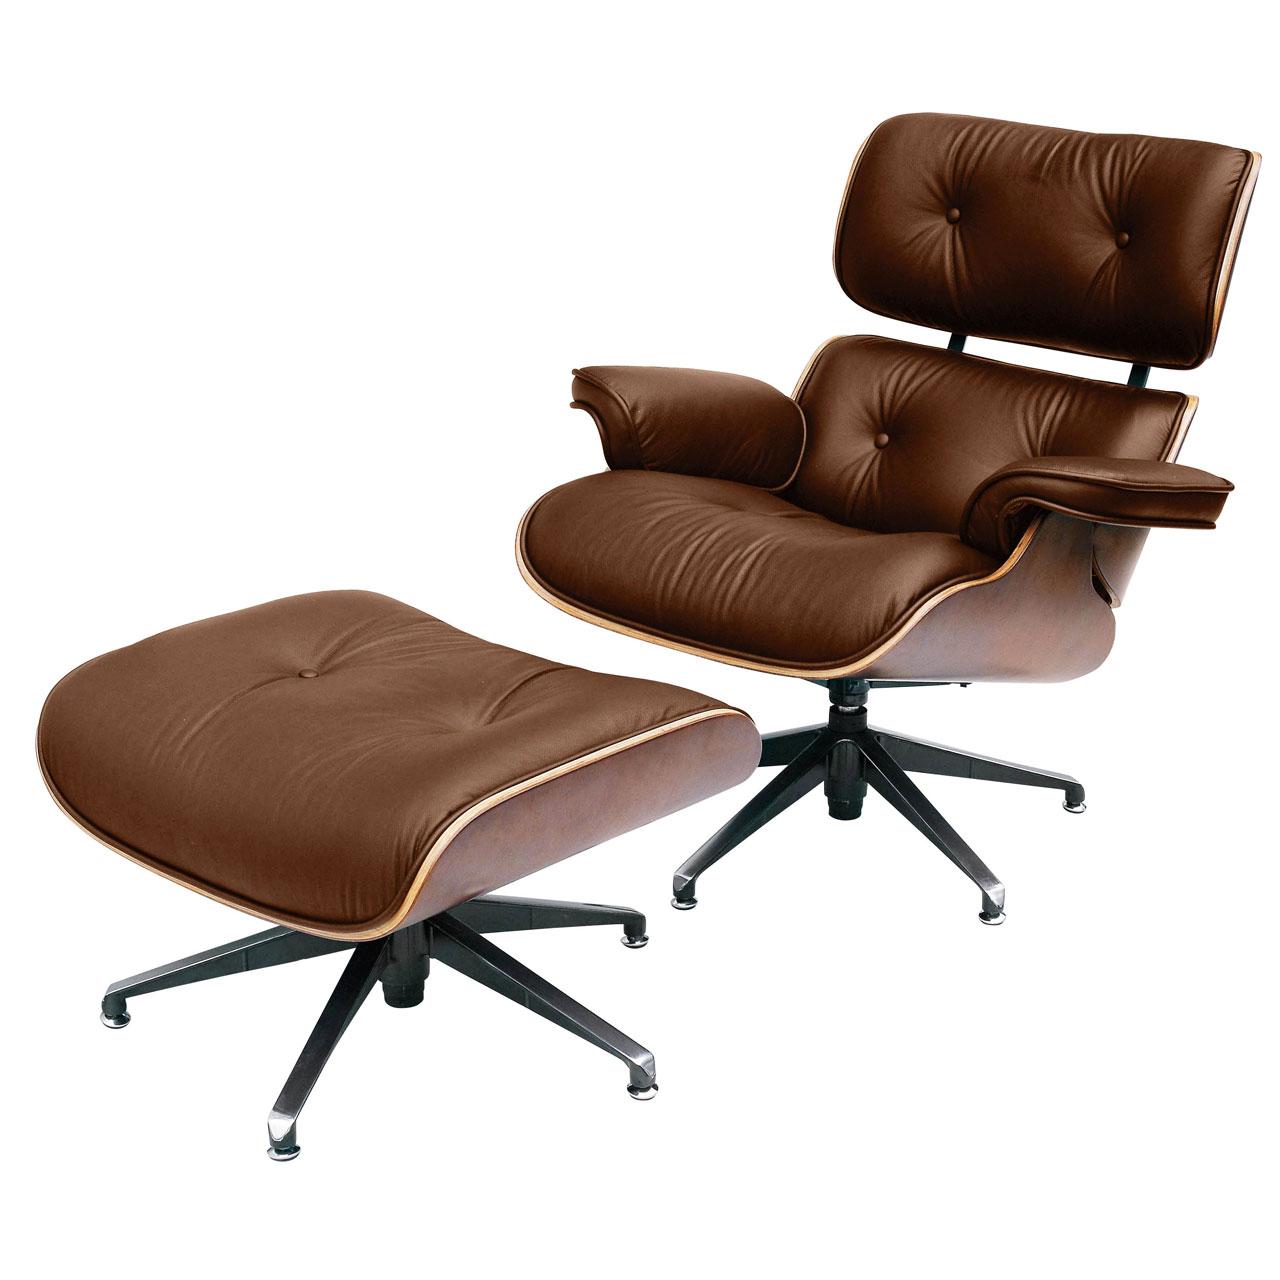 ... Bowbridge Chair And Footstool ...